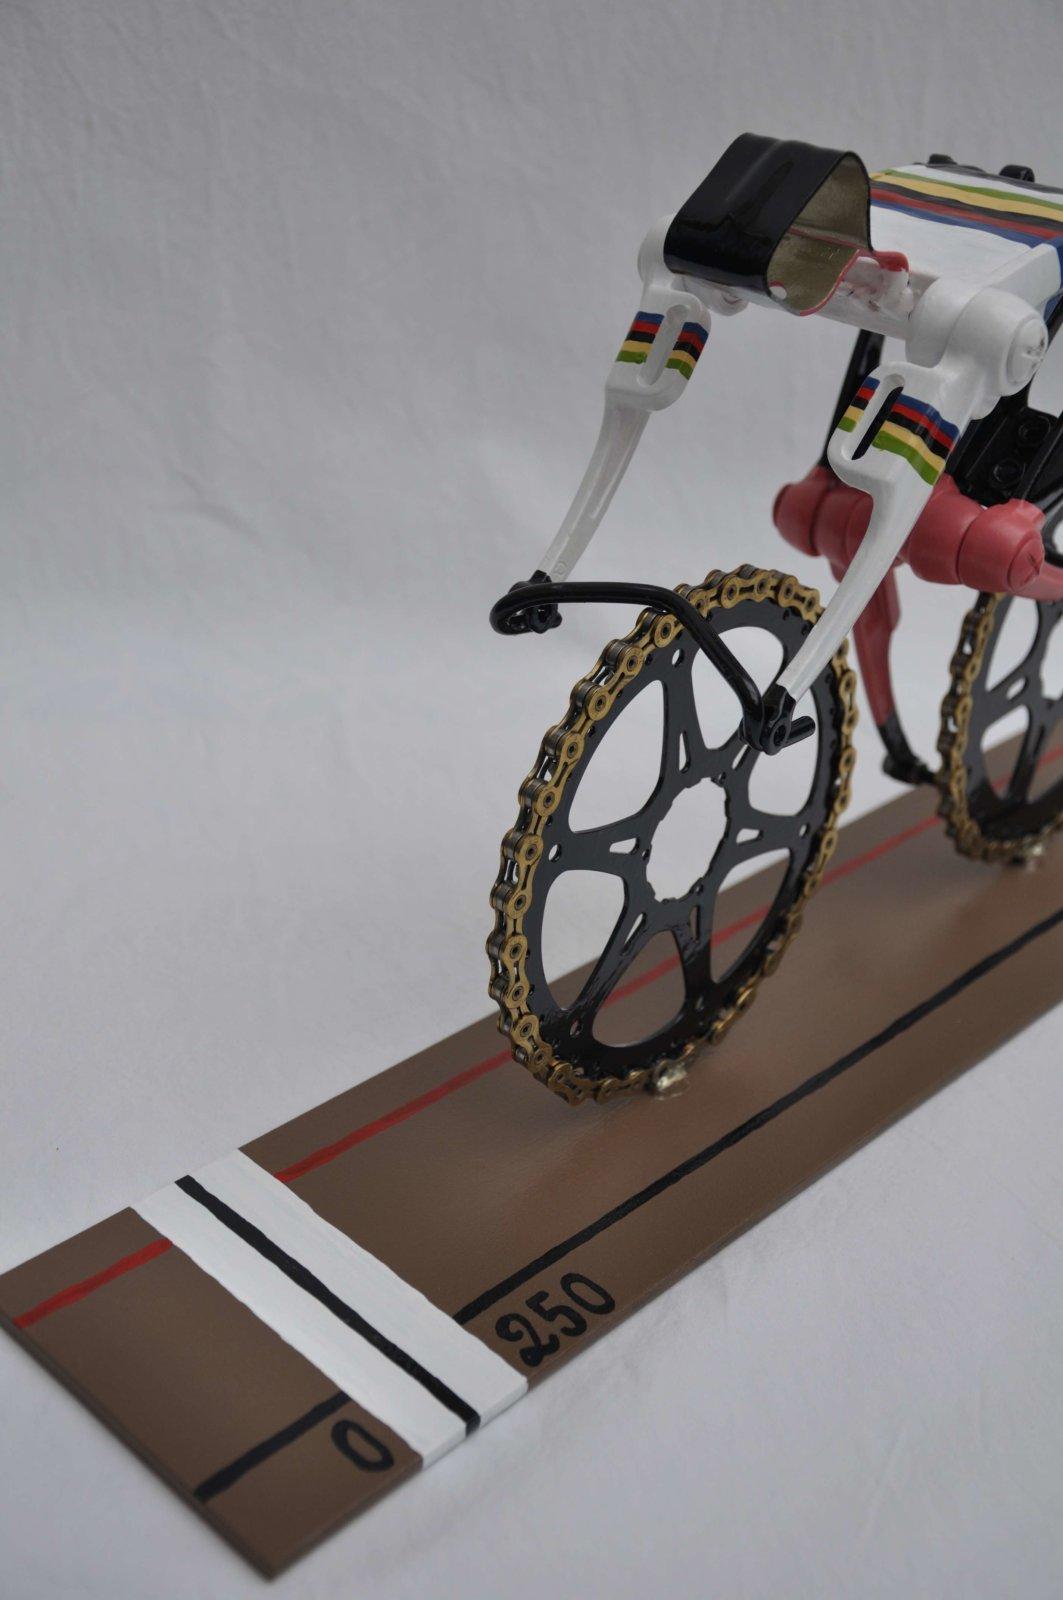 Finishline Trackcycling Velodrom Omnisport Apeldoorn World Champion Cyclist Art By Decreatievelink